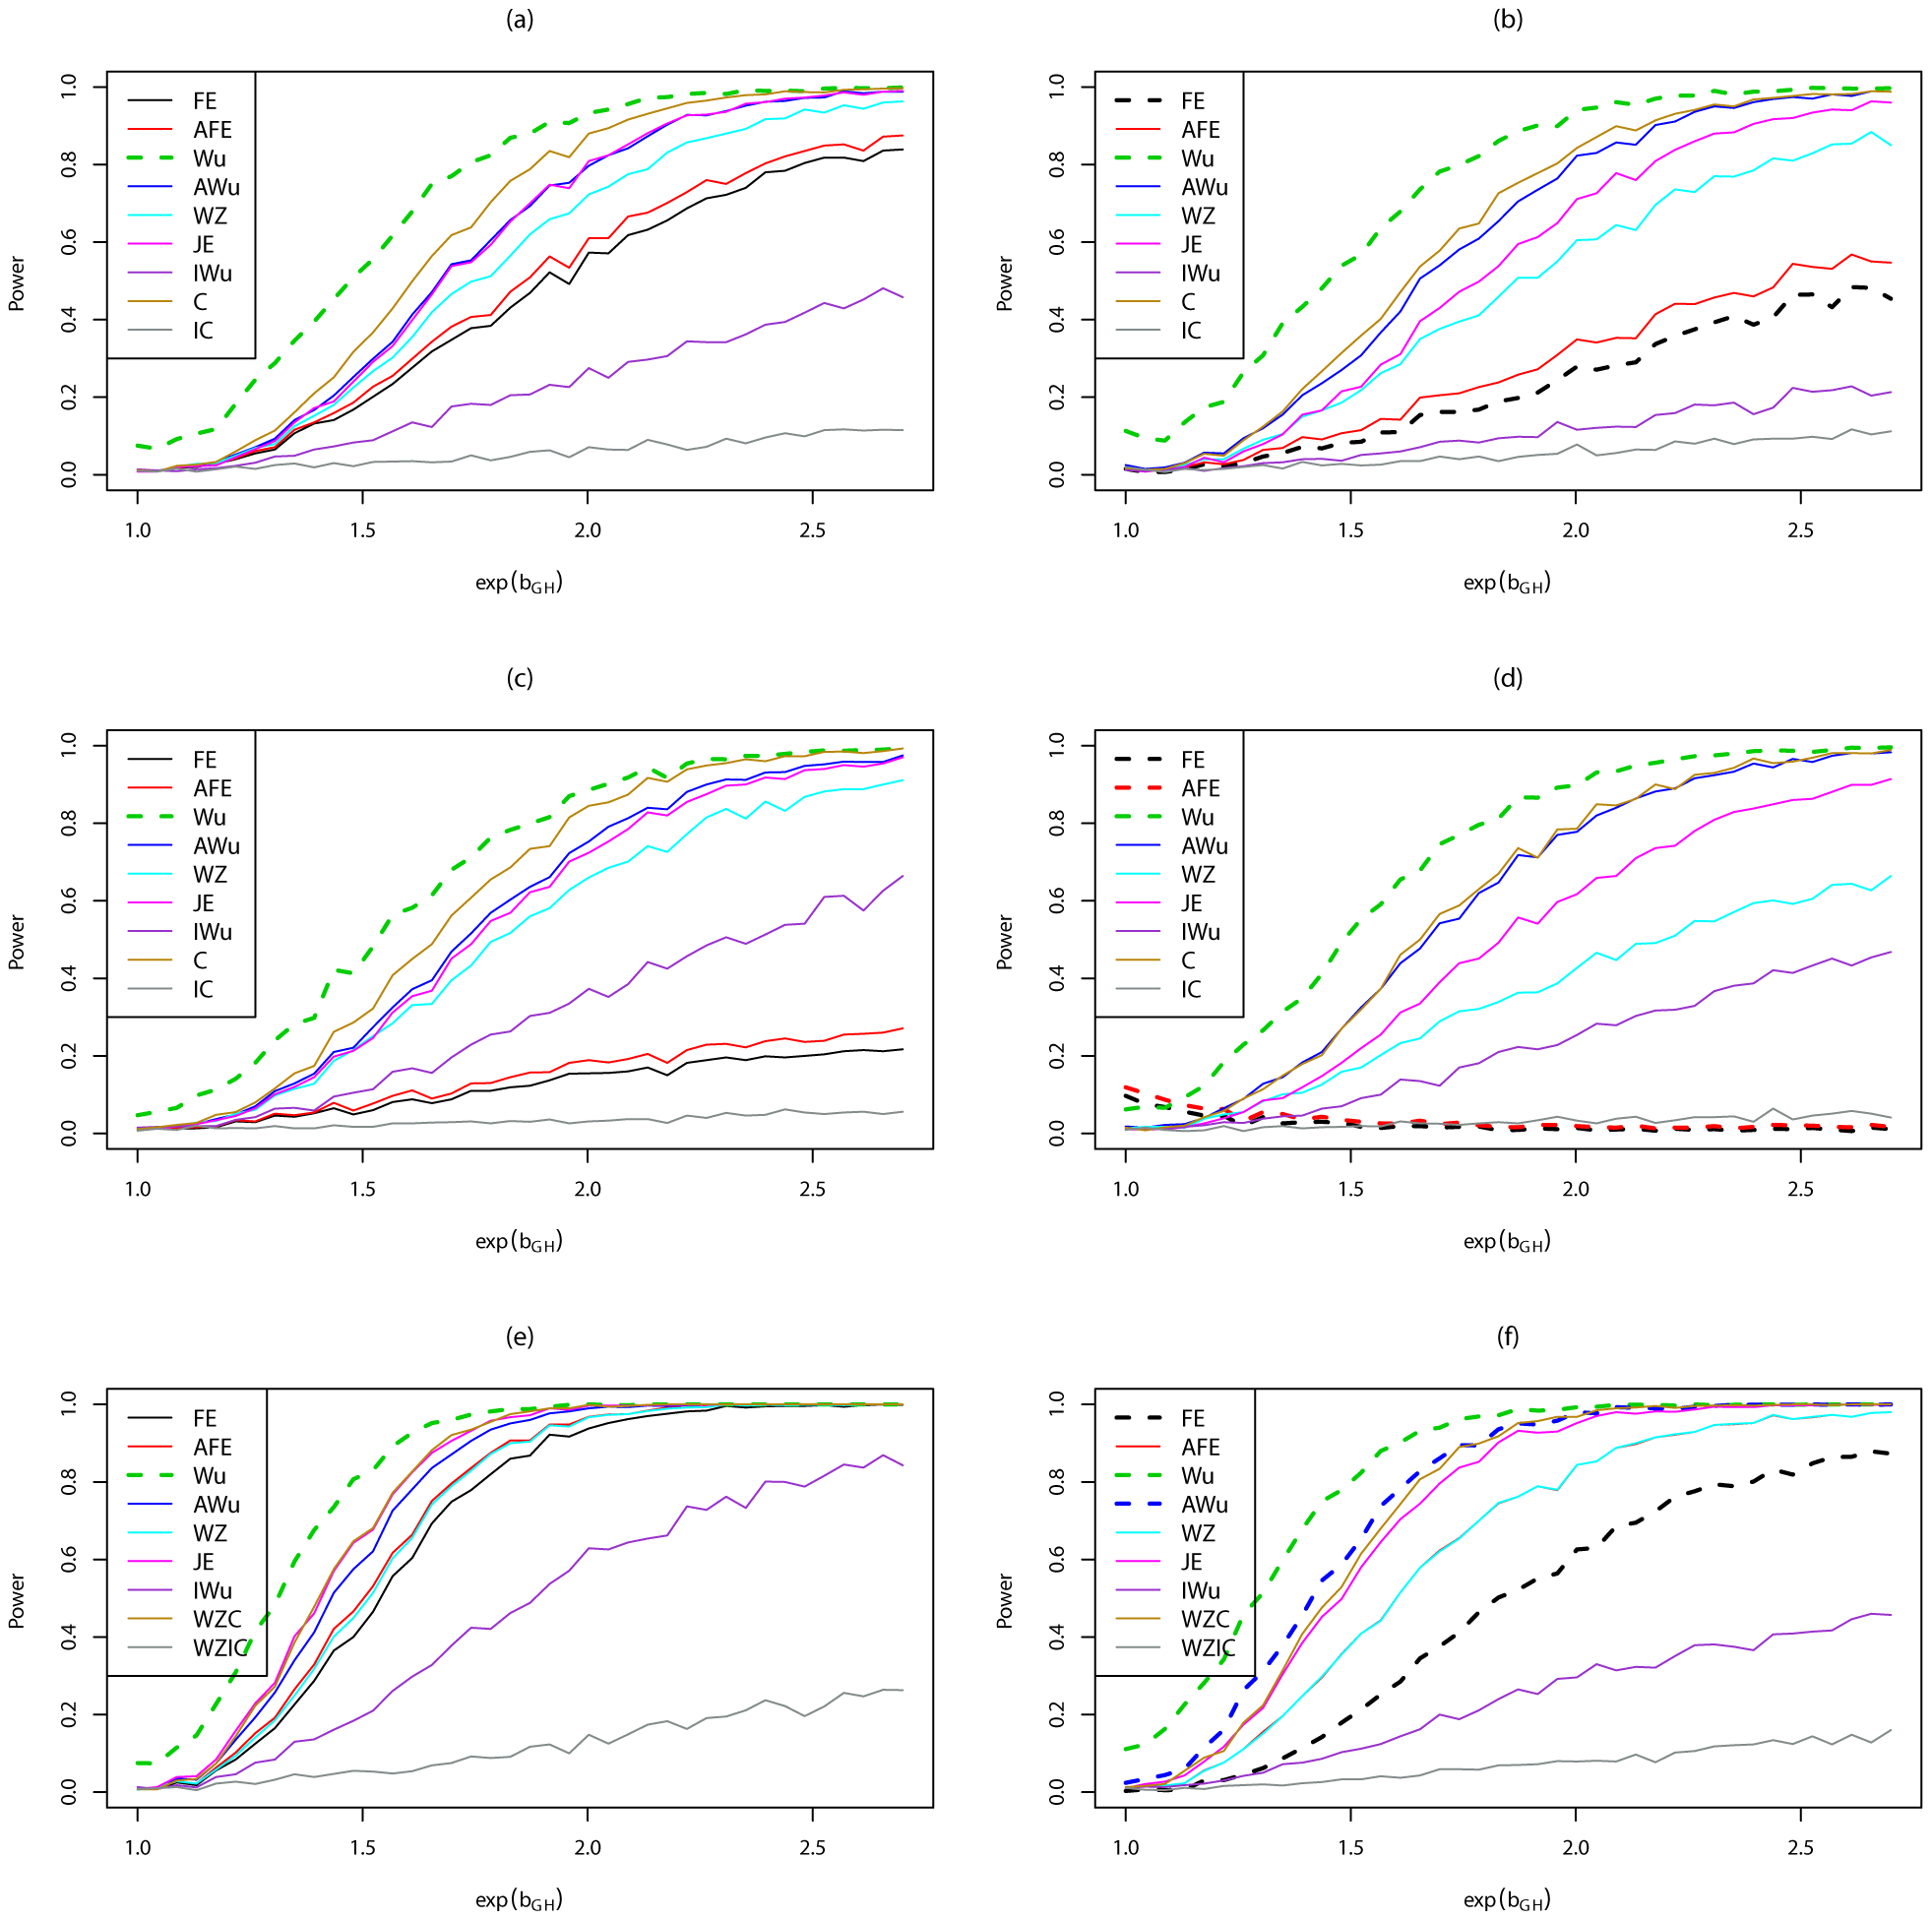 Power curves for Scenario 7 (Dominant  Dominant).